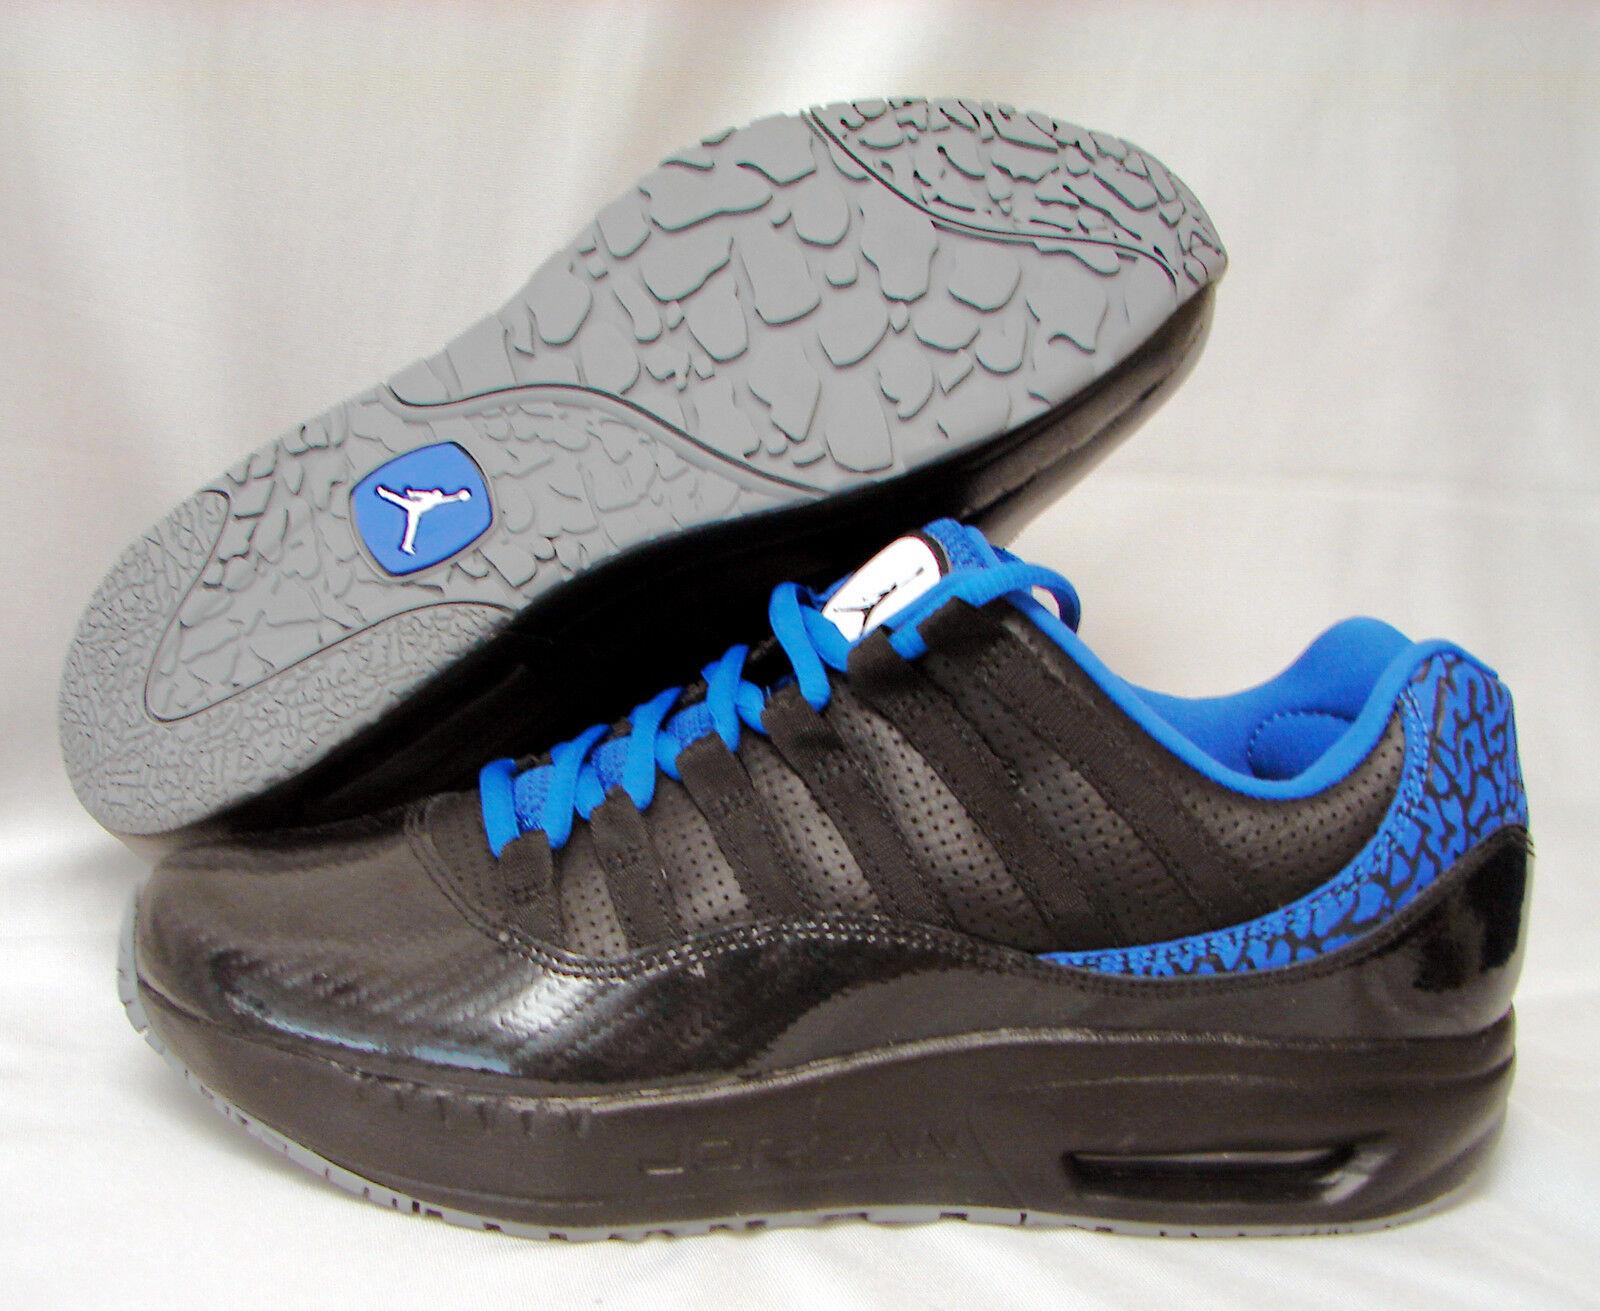 NIKE AIR JORDAN CMFT VIZ XI Men's Basketball shoes-Black Varsity Royal-NWOB